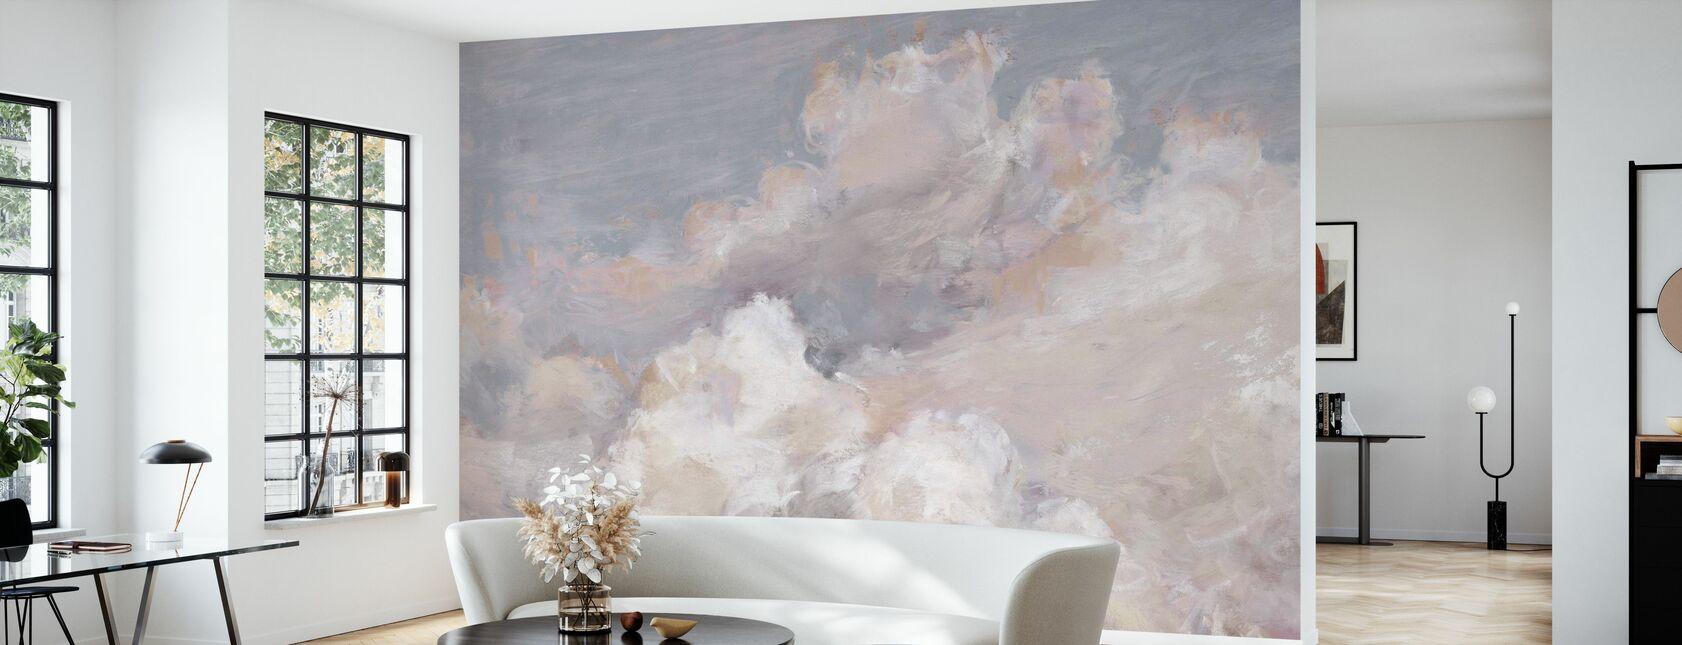 Daydream Neutral 01 - Wallpaper - Living Room